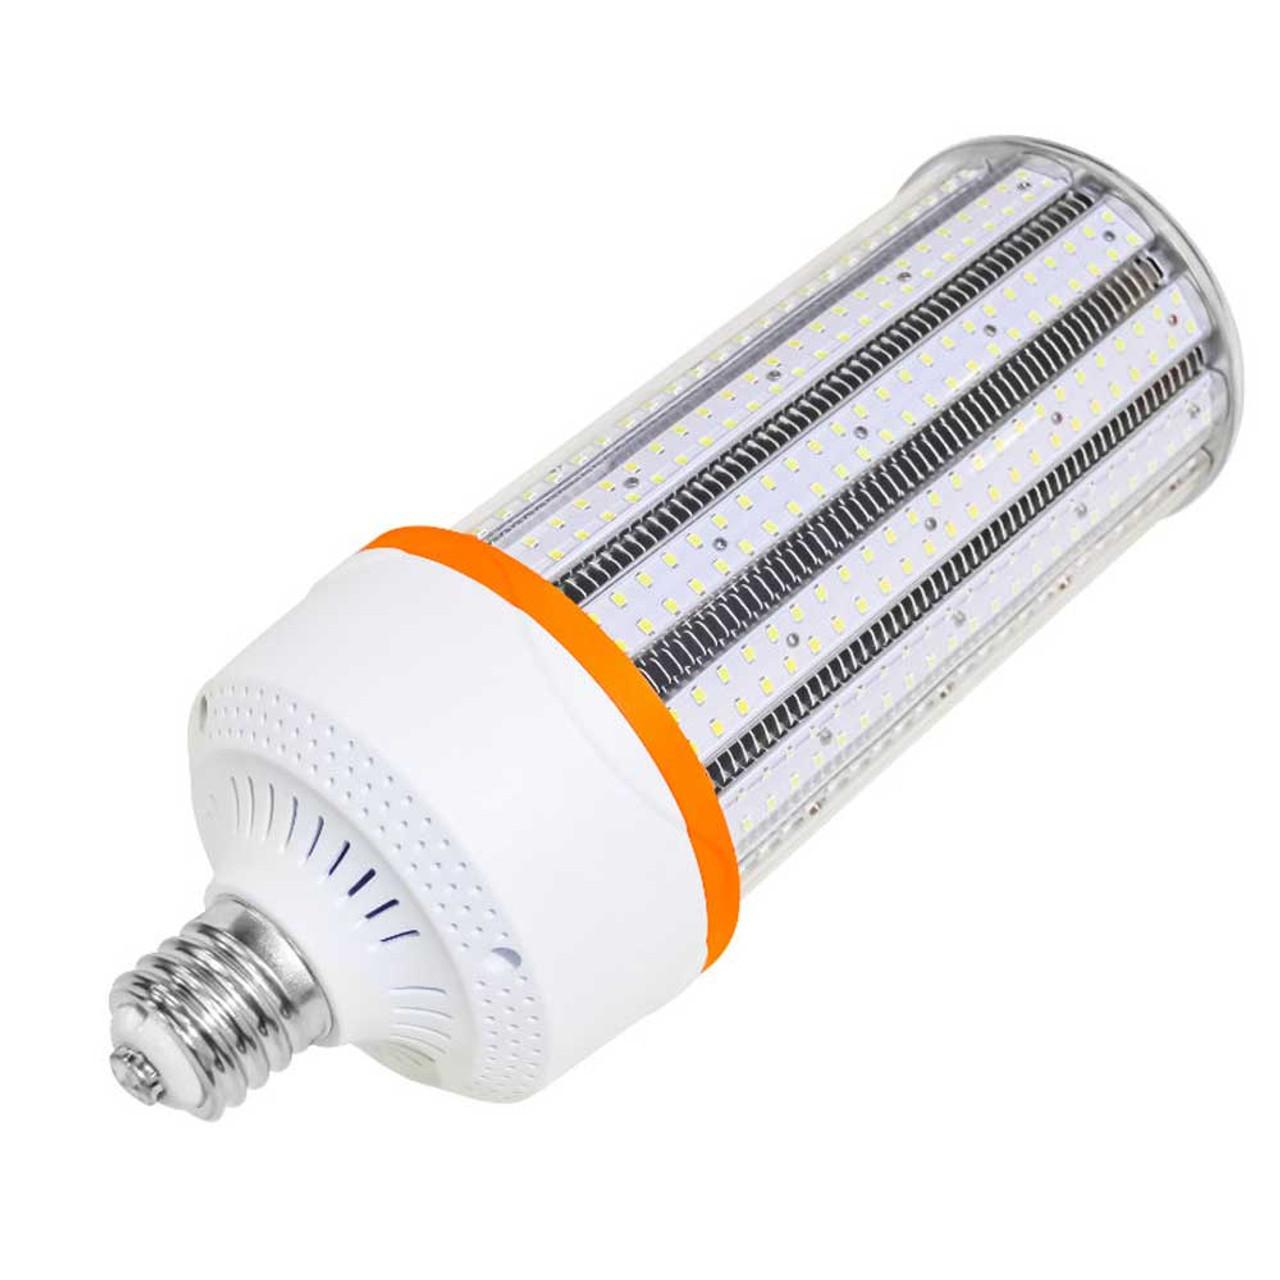 1000 Watt Metal Halide Led Replacement 200 watt led corn bulb, replaces 1,000 watt hid, 30,000 lumens, ip64, dlc  listed, 50,000 hours, 10 year warranty